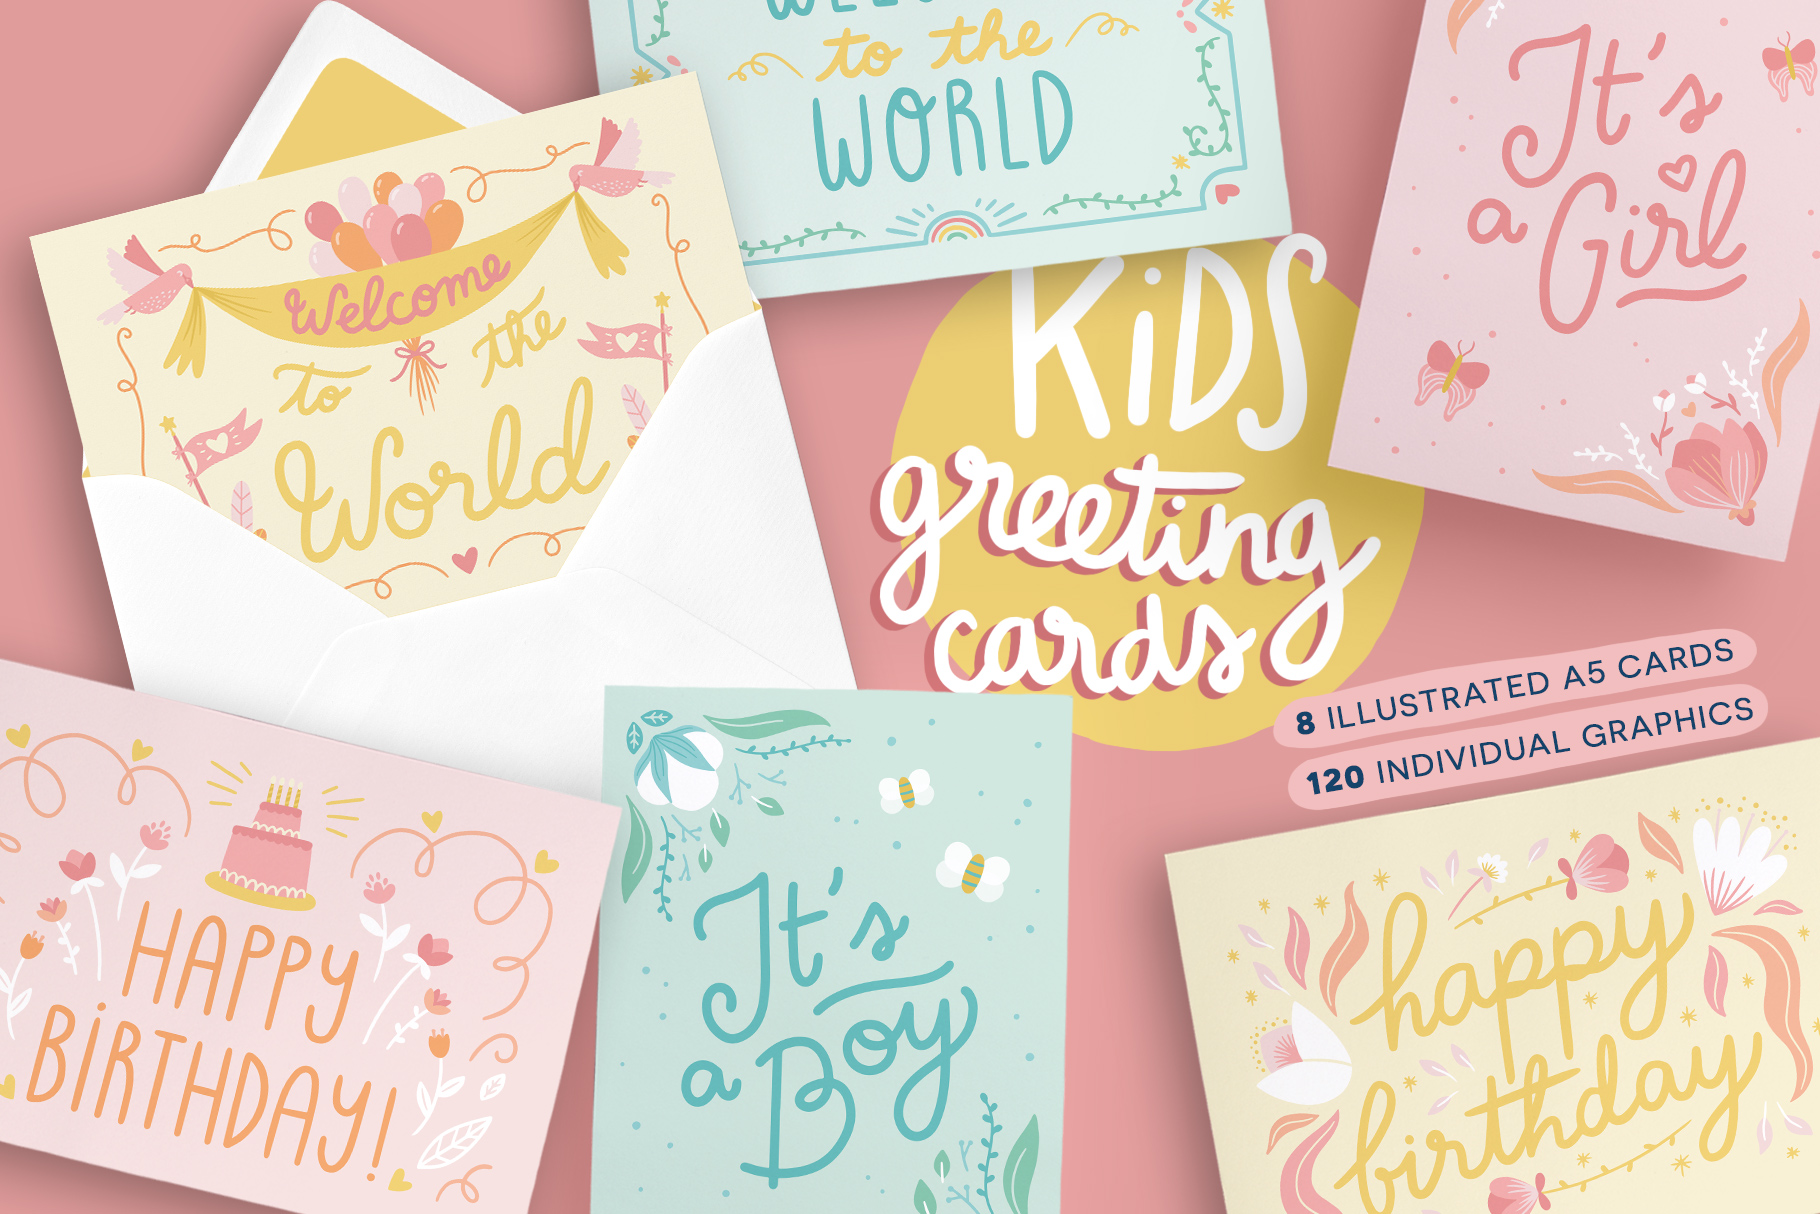 Kids-Greeting-Cards-1_amended.jpg